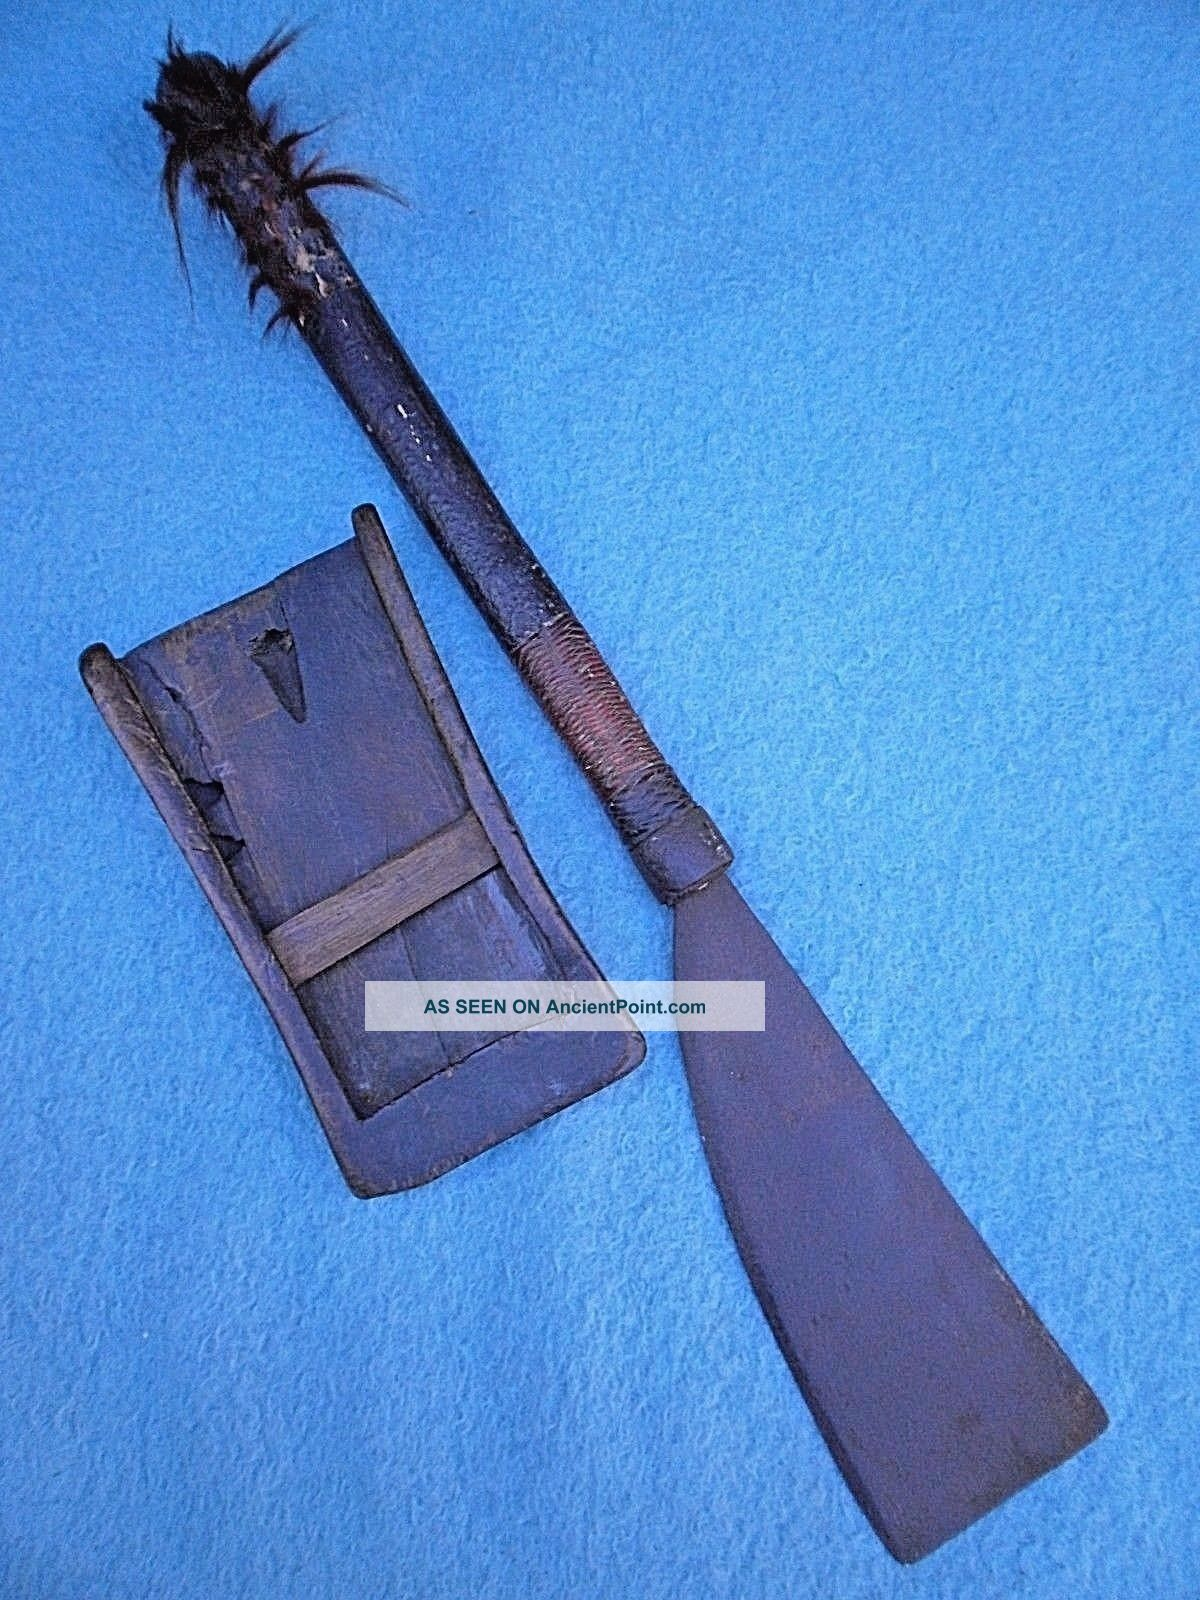 Antique 19thc Naga Dao Sword Axe Headhunter Assam Burmese Dha Knife Asian Dagger Other Southeast Asian Antiques photo